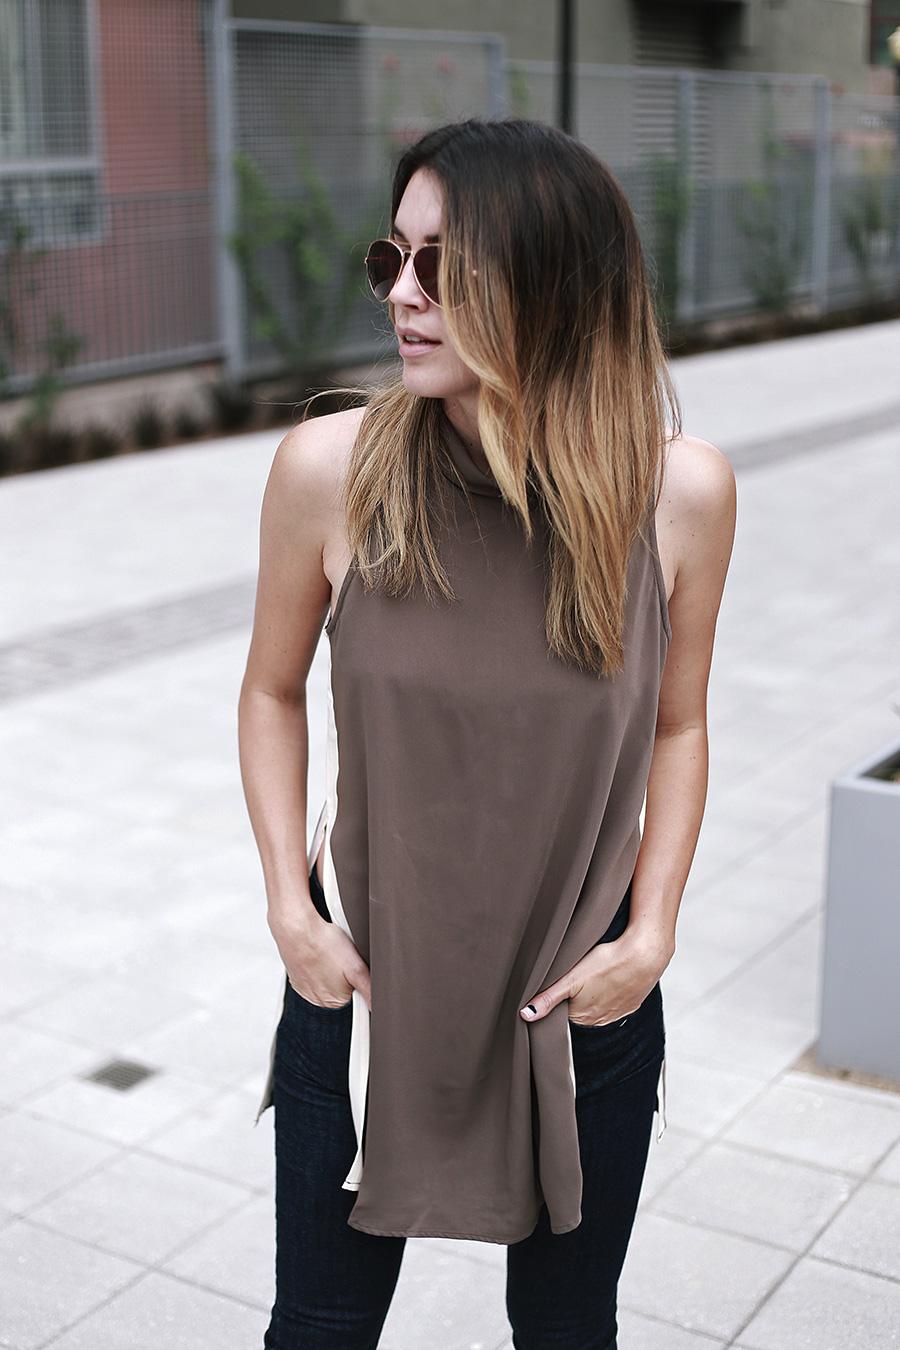 forever21 side slit tunic forever21 denim white heels thrifts and threads 1